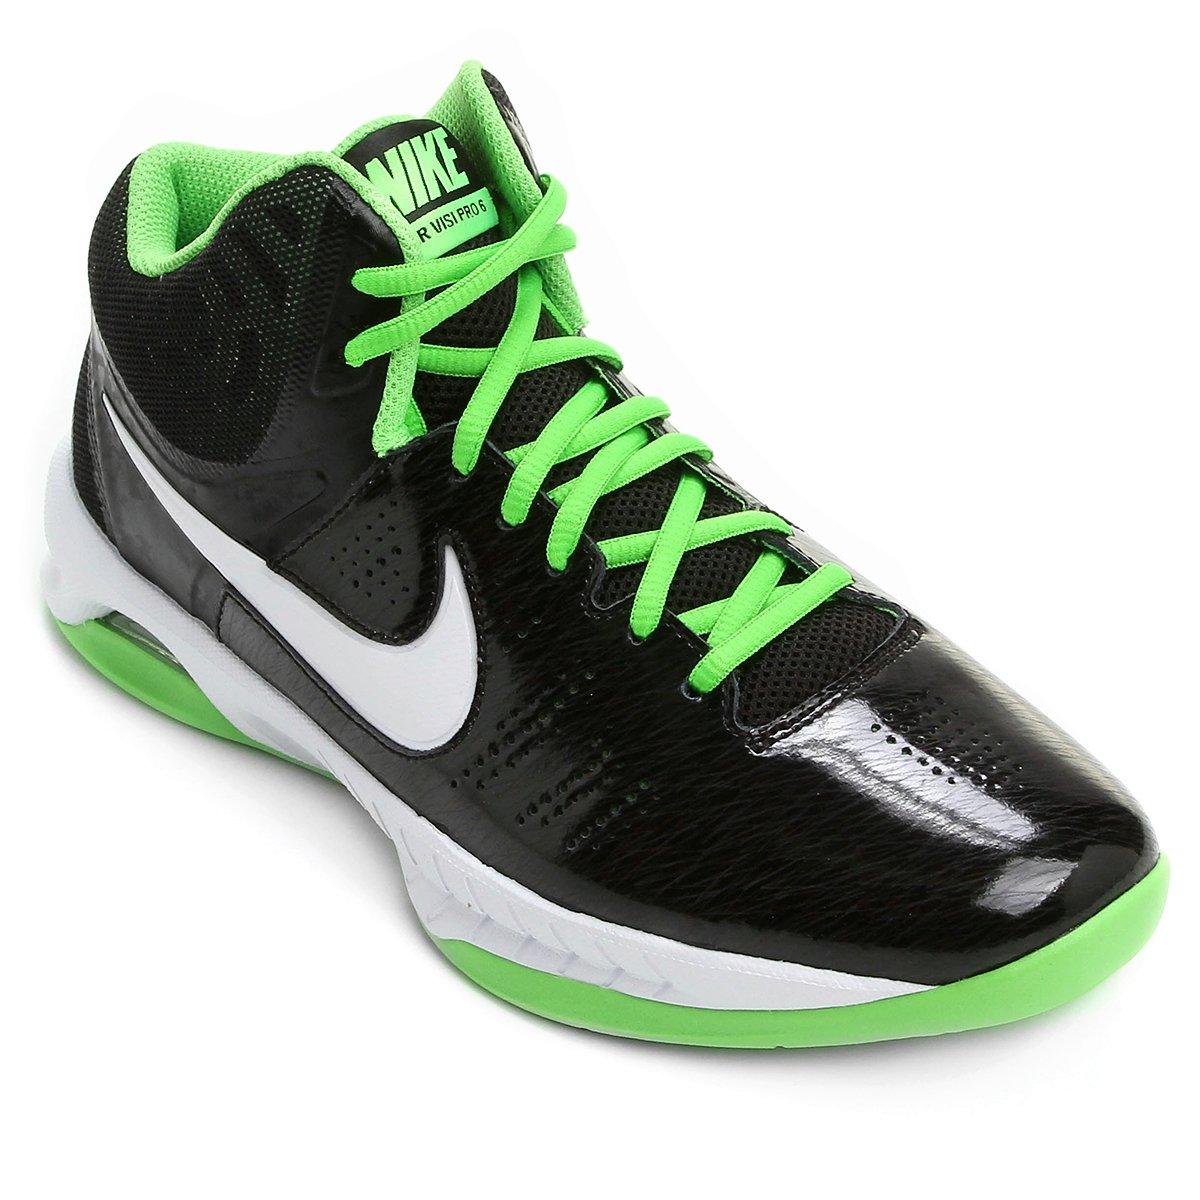 542fd579129 Tênis Nike Air Visi Pro VI 749167-011 - Preto Verde - Botas Online ...